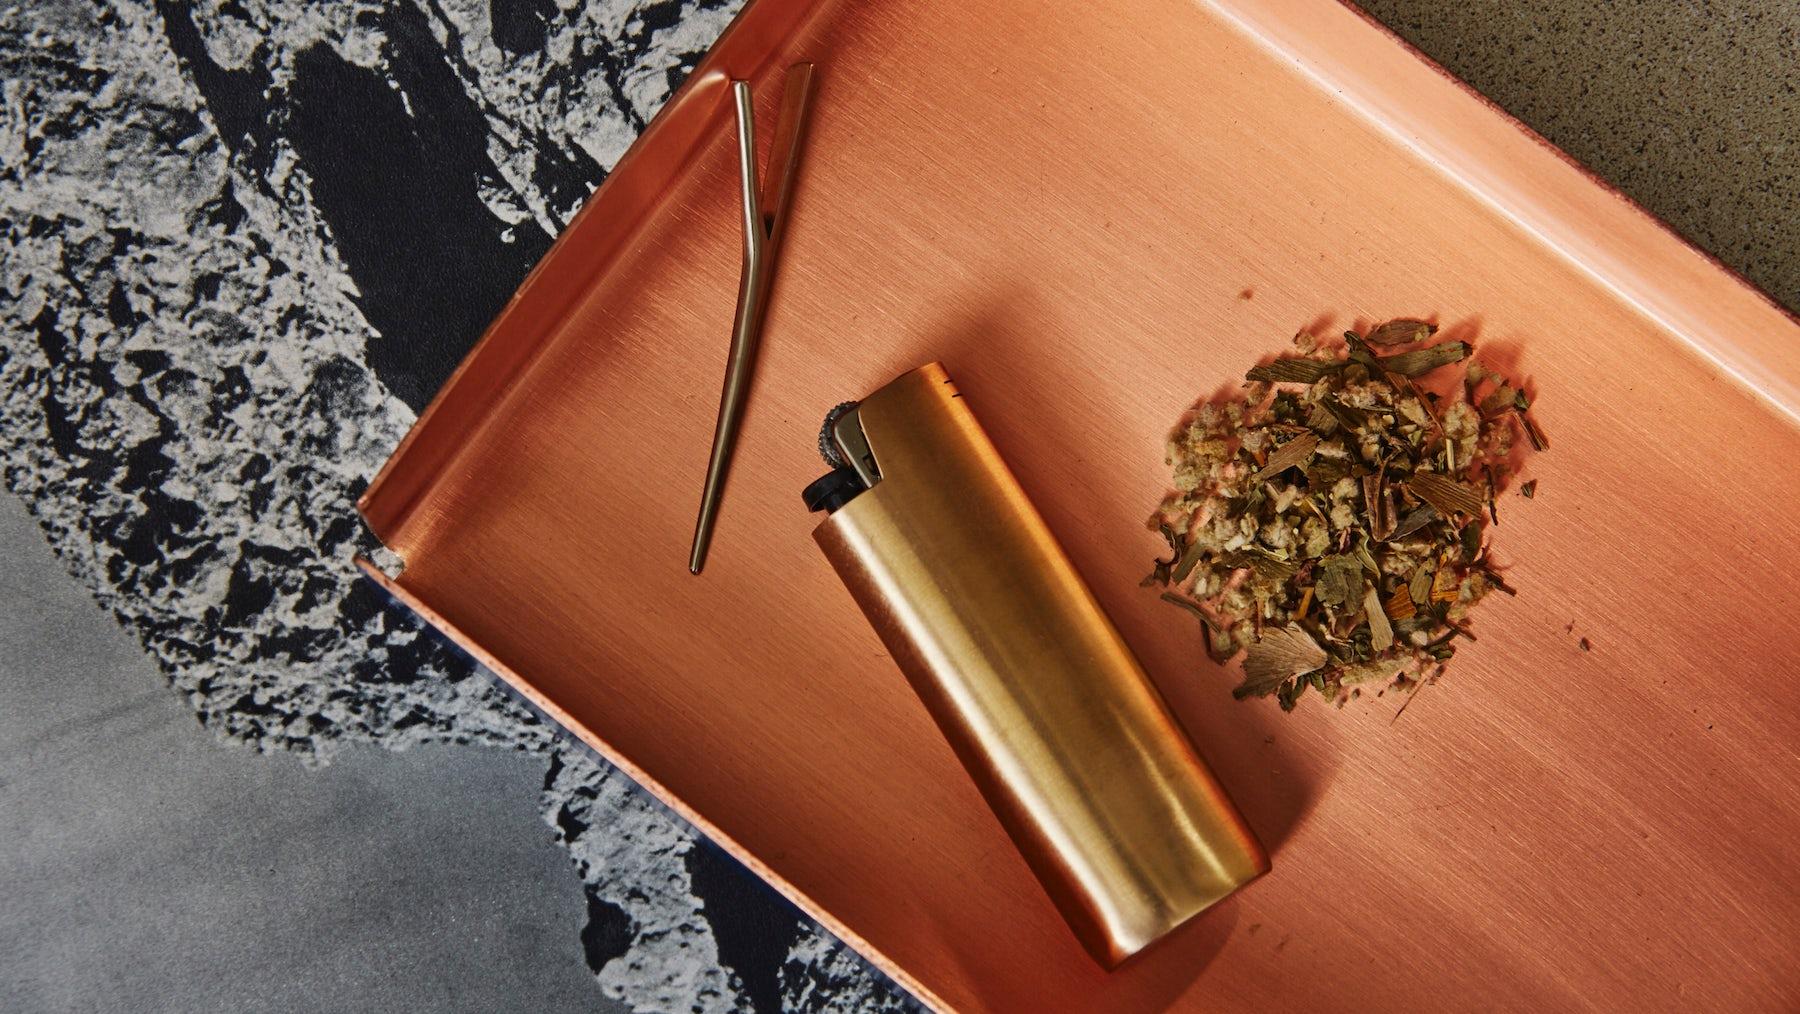 Tetra luxury smoking accessories   Source: Courtesy